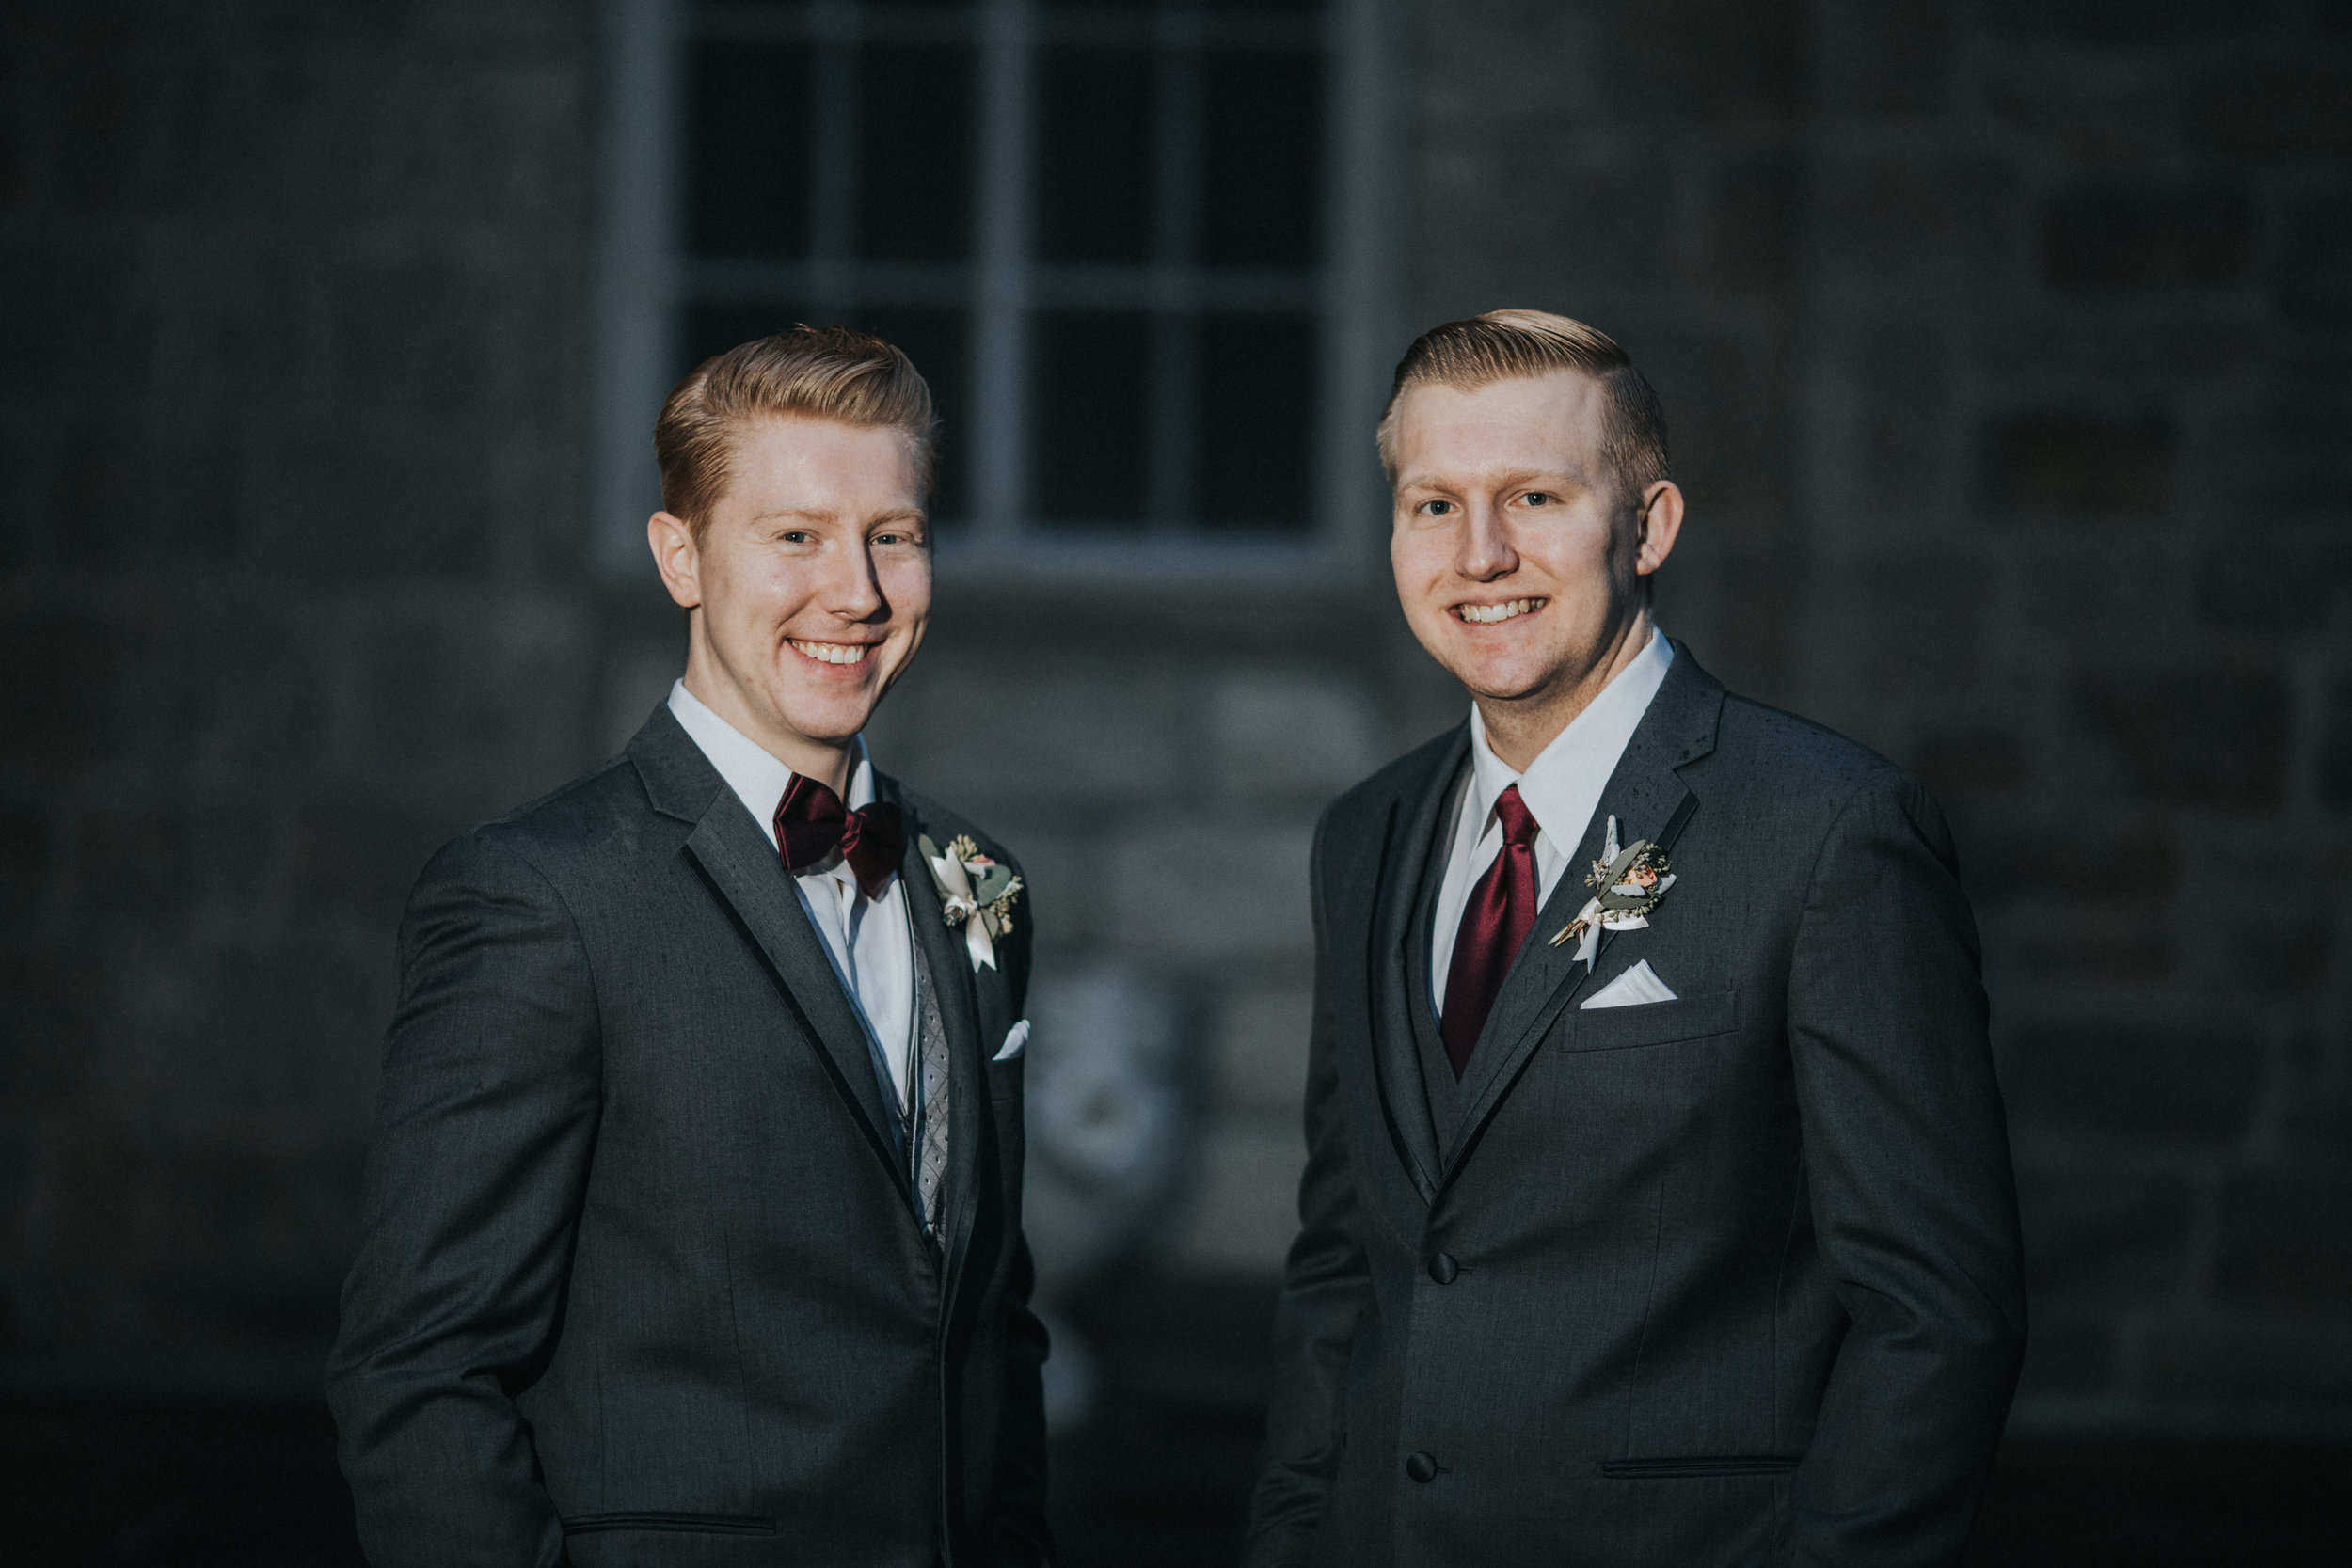 New-Jersey-Wedding-Photography-Fishers-Tudor-House-JennaLynnPhotography-BridalParty-Kathleen&Eddie-41.jpg